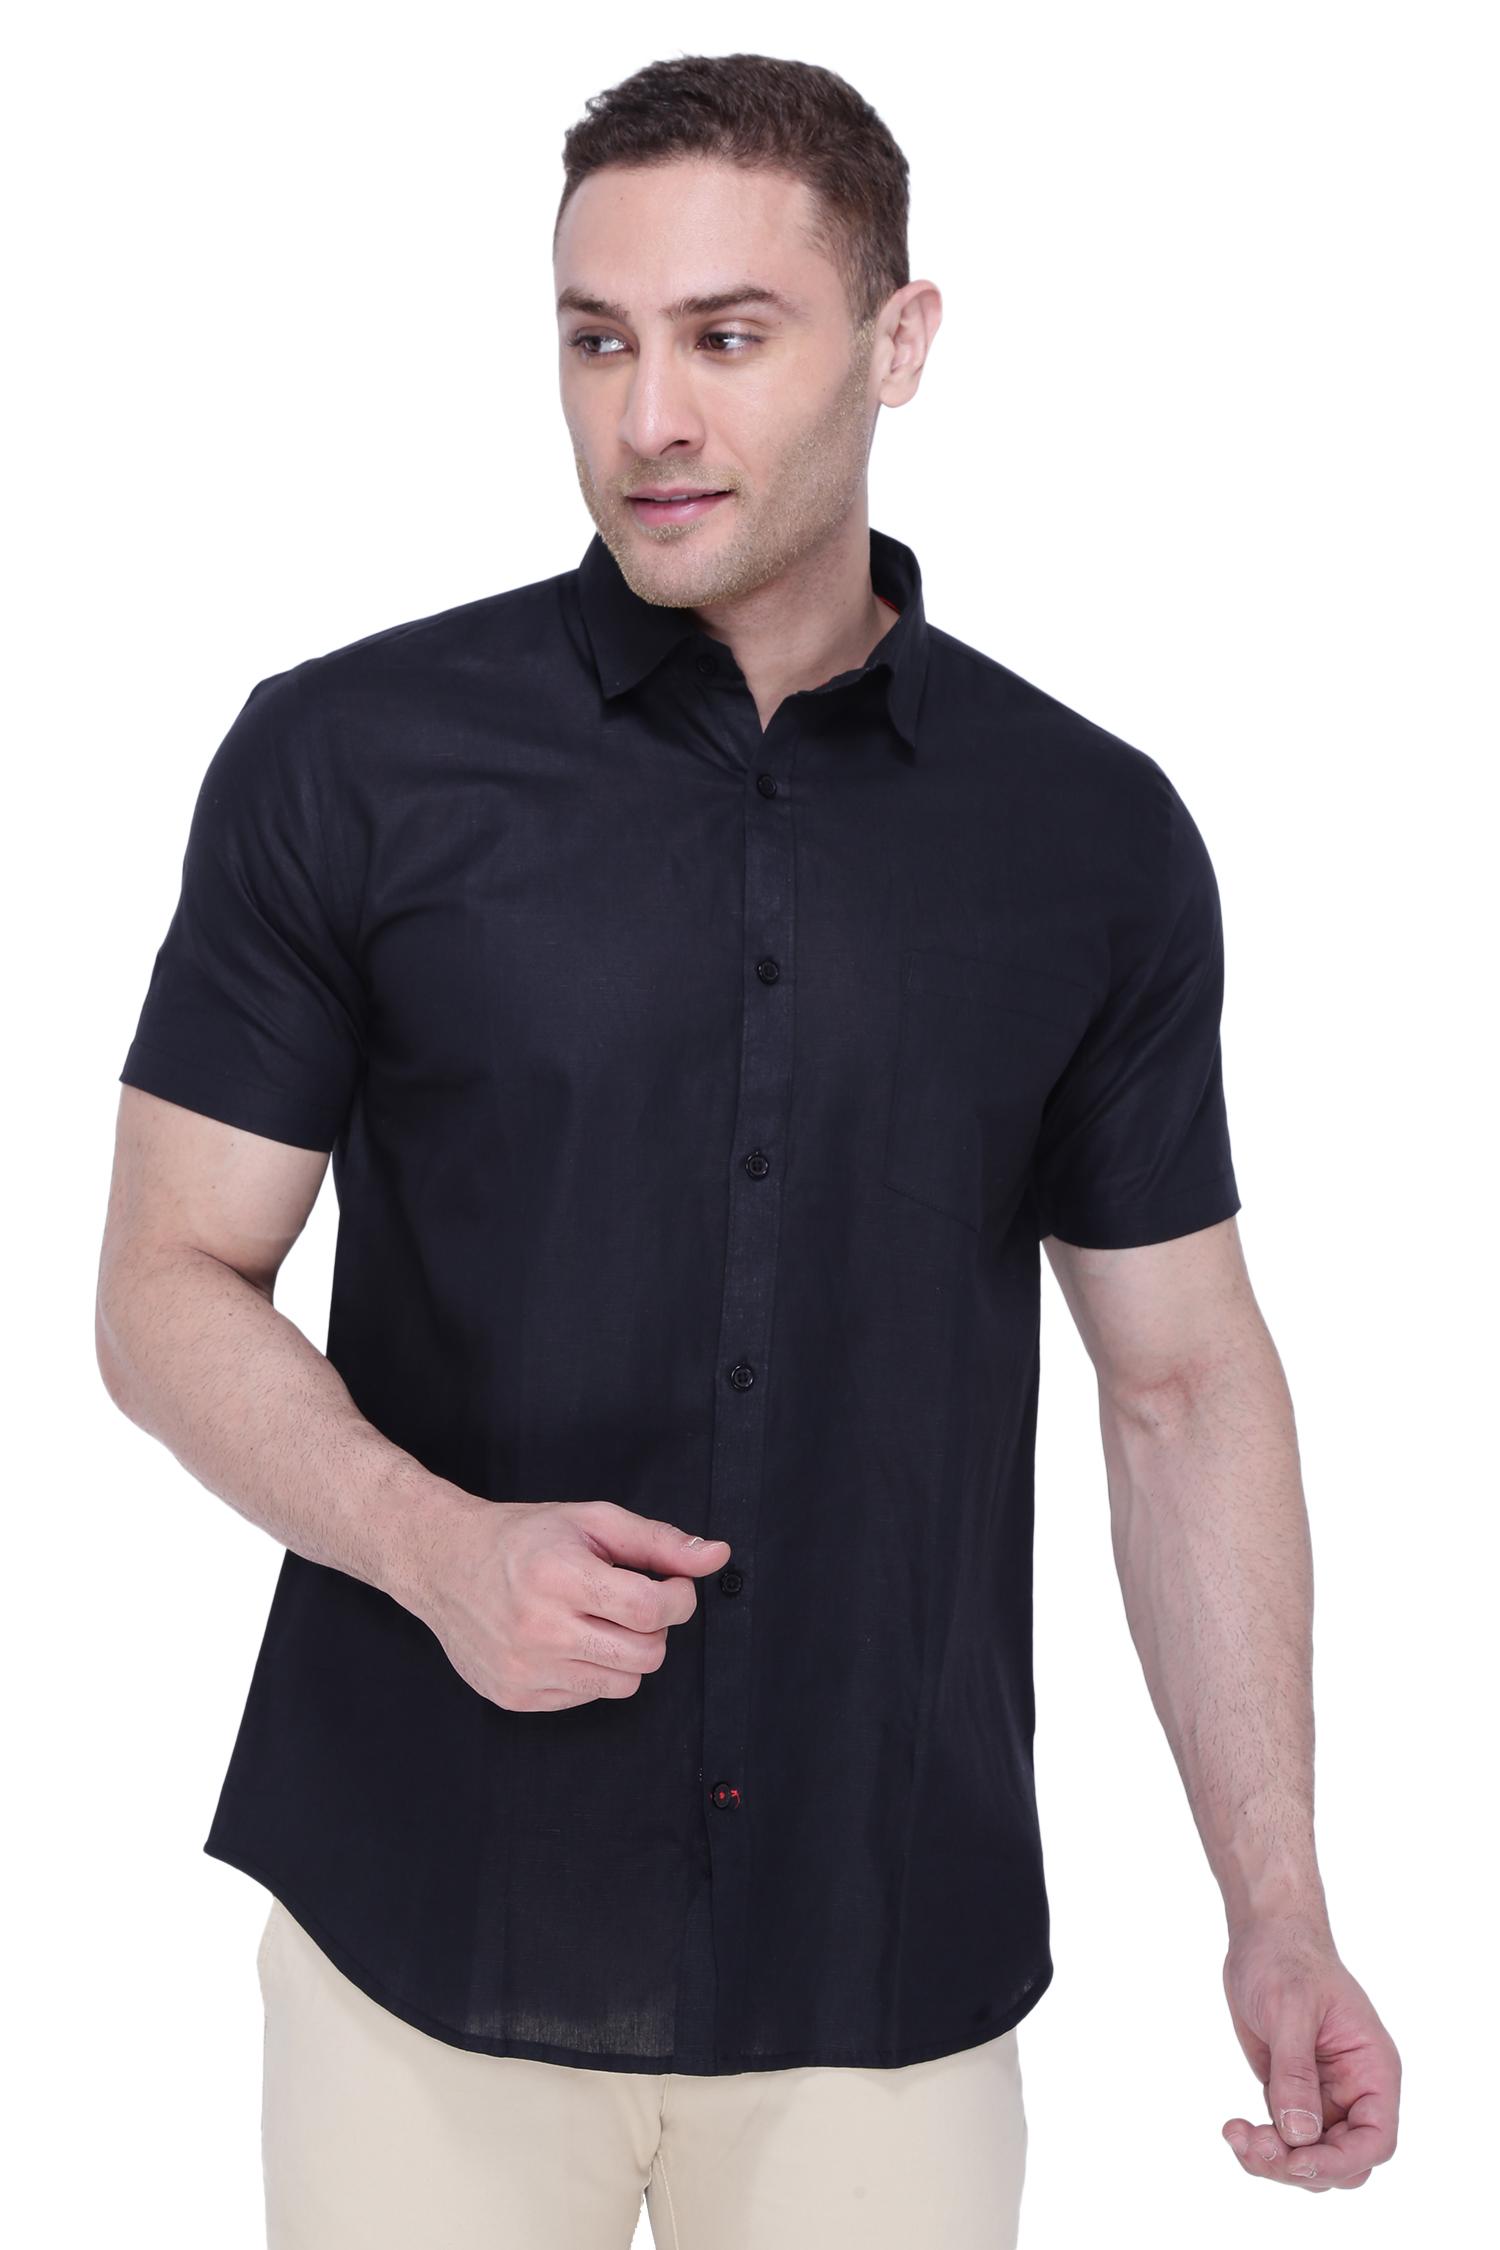 Southbay | Southbay Men's Black Half Sleeve Linen Cotton Formal Shirt-SBCLHS230BL